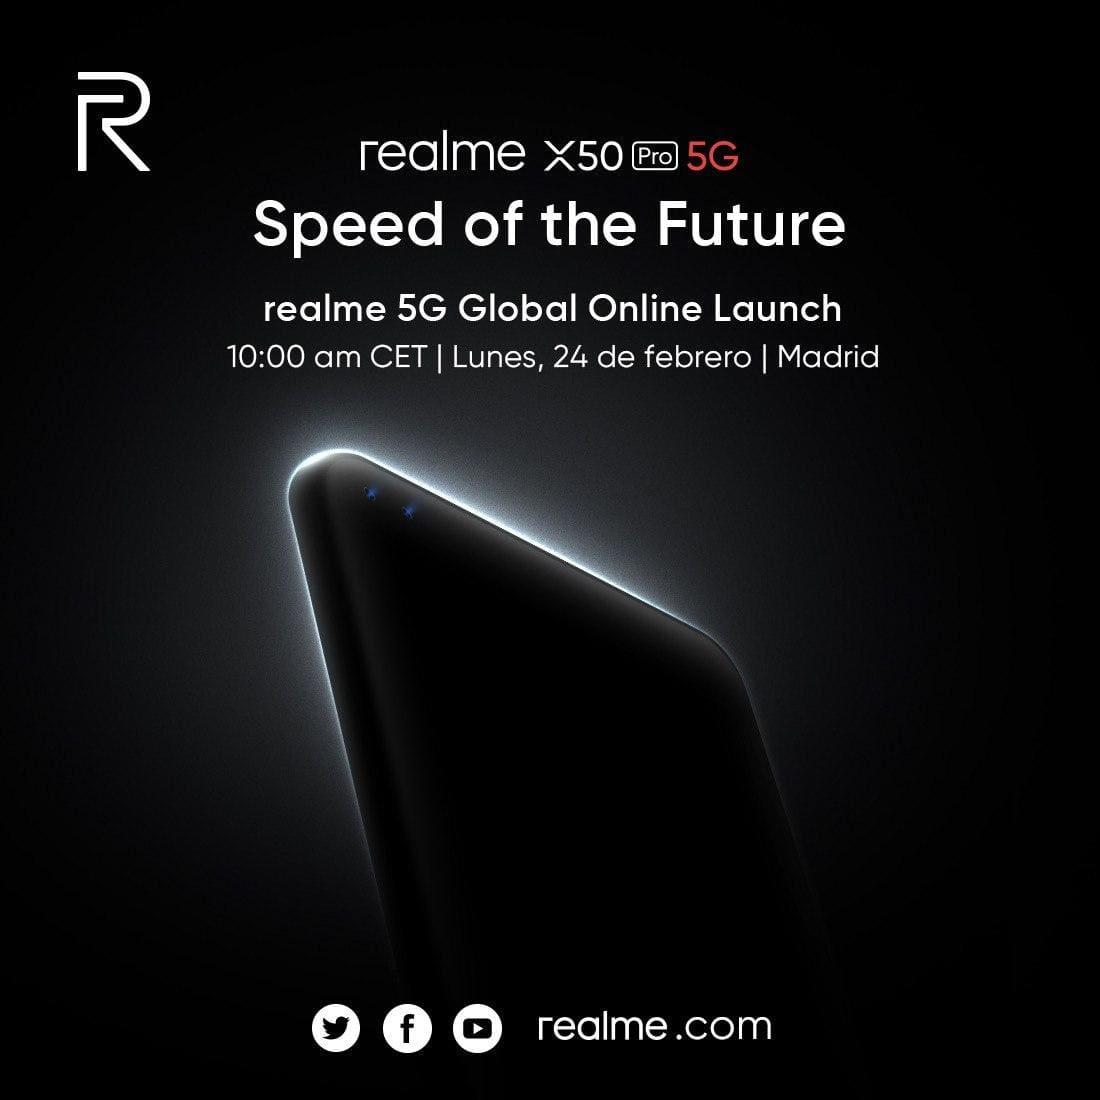 presentacion-Realme-x50-Pro-5G